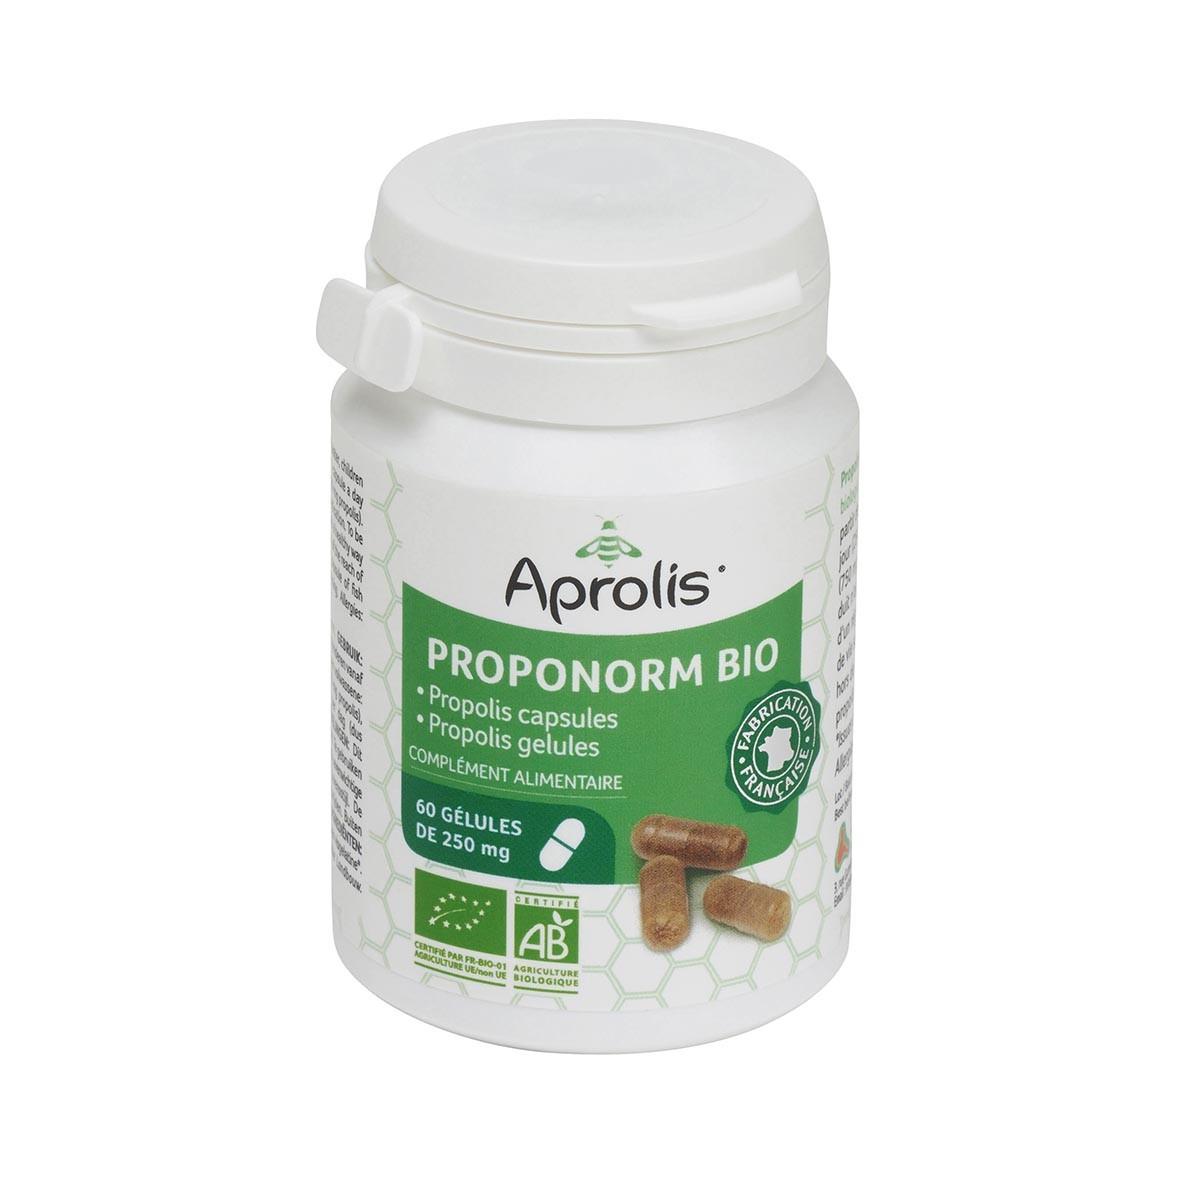 Aprolis - Proponorm 60 gél. Bio